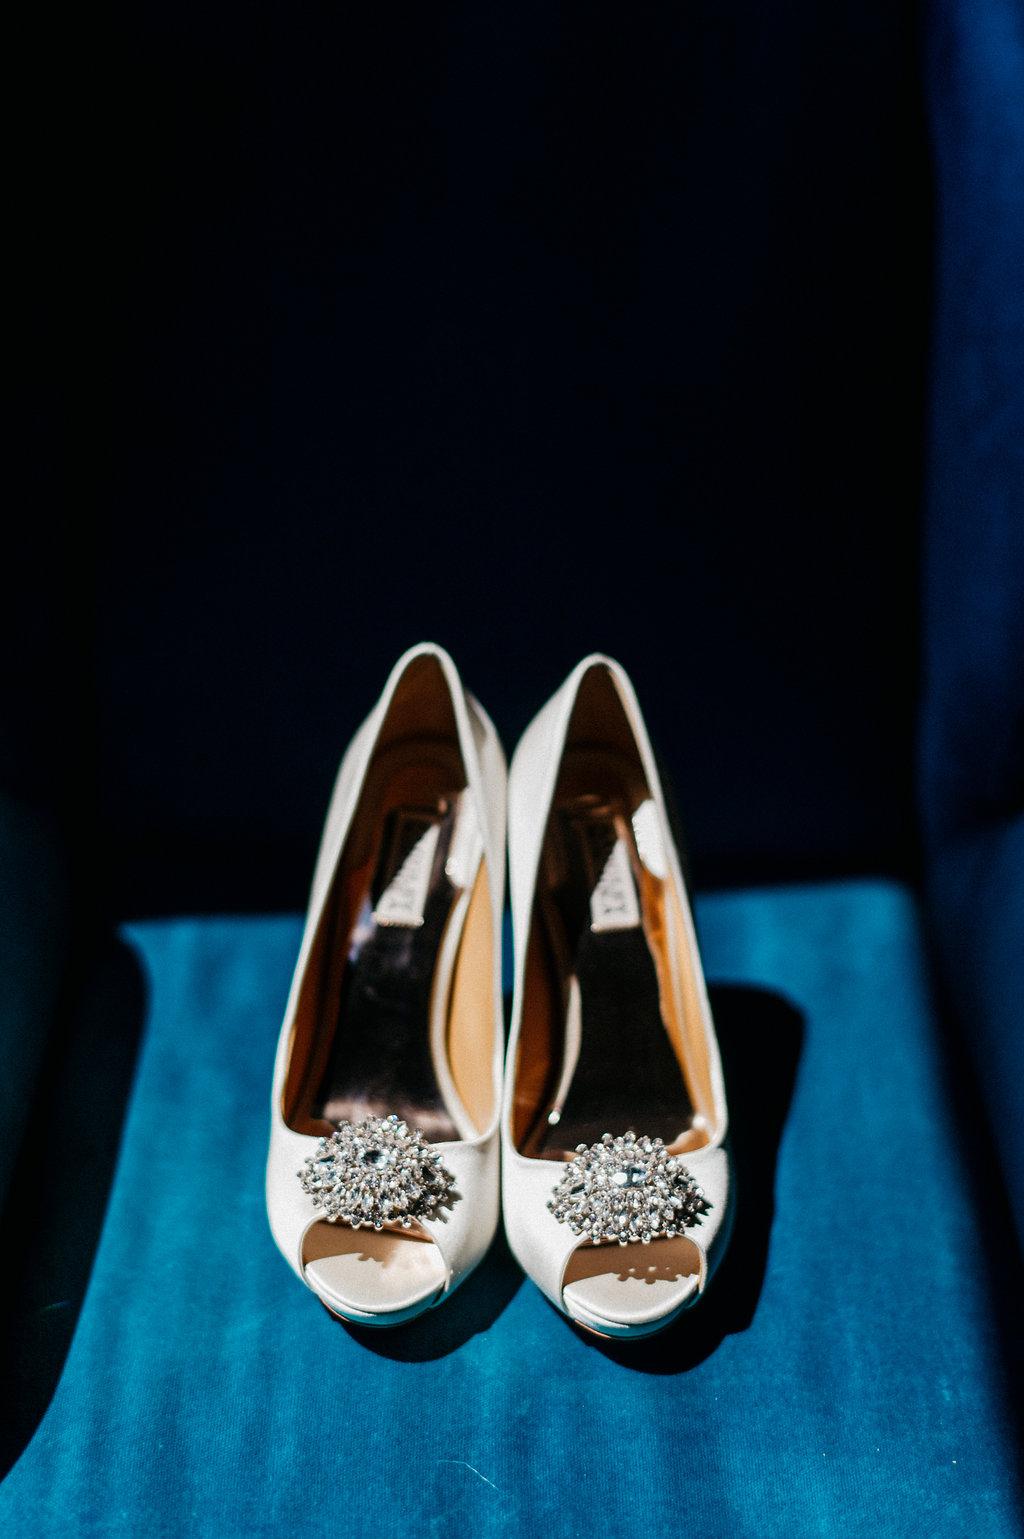 engle-olson-gene-pease-st-paul-wedding-84.jpg